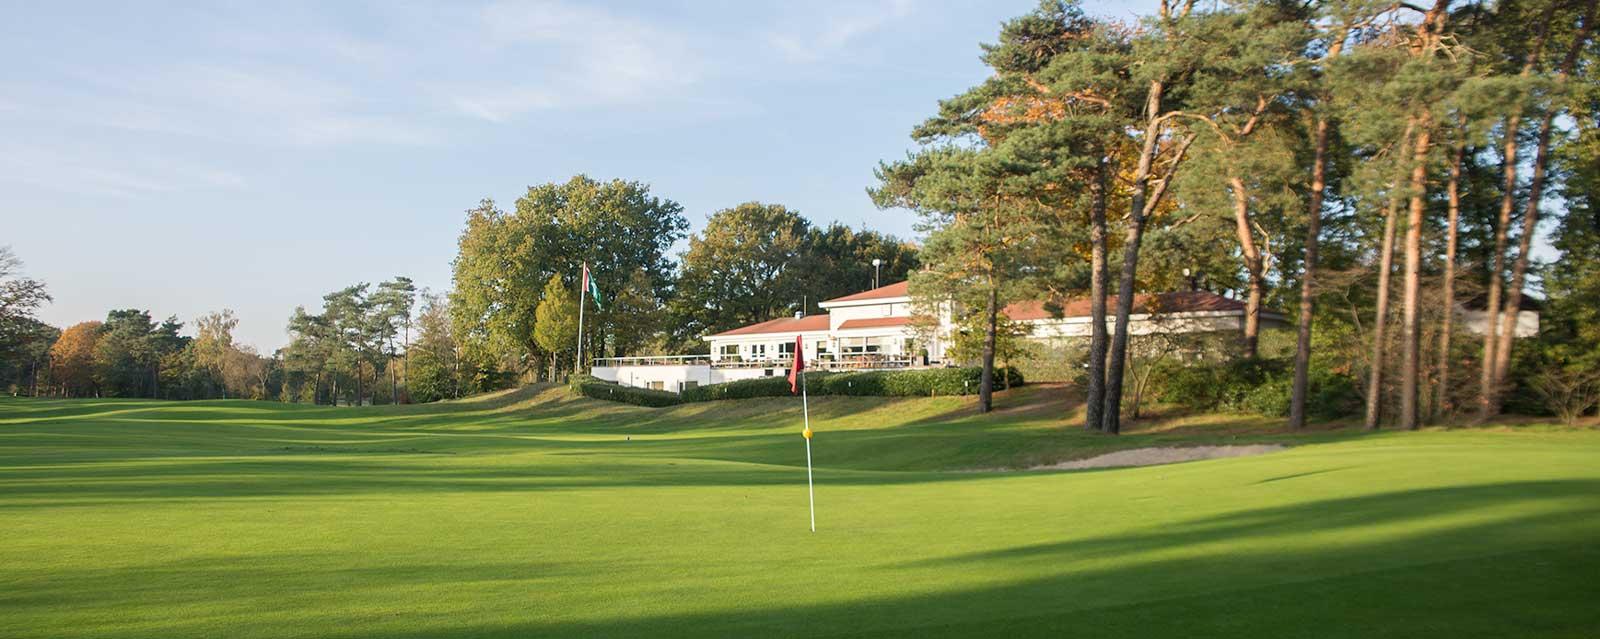 Golfclub Toxandria